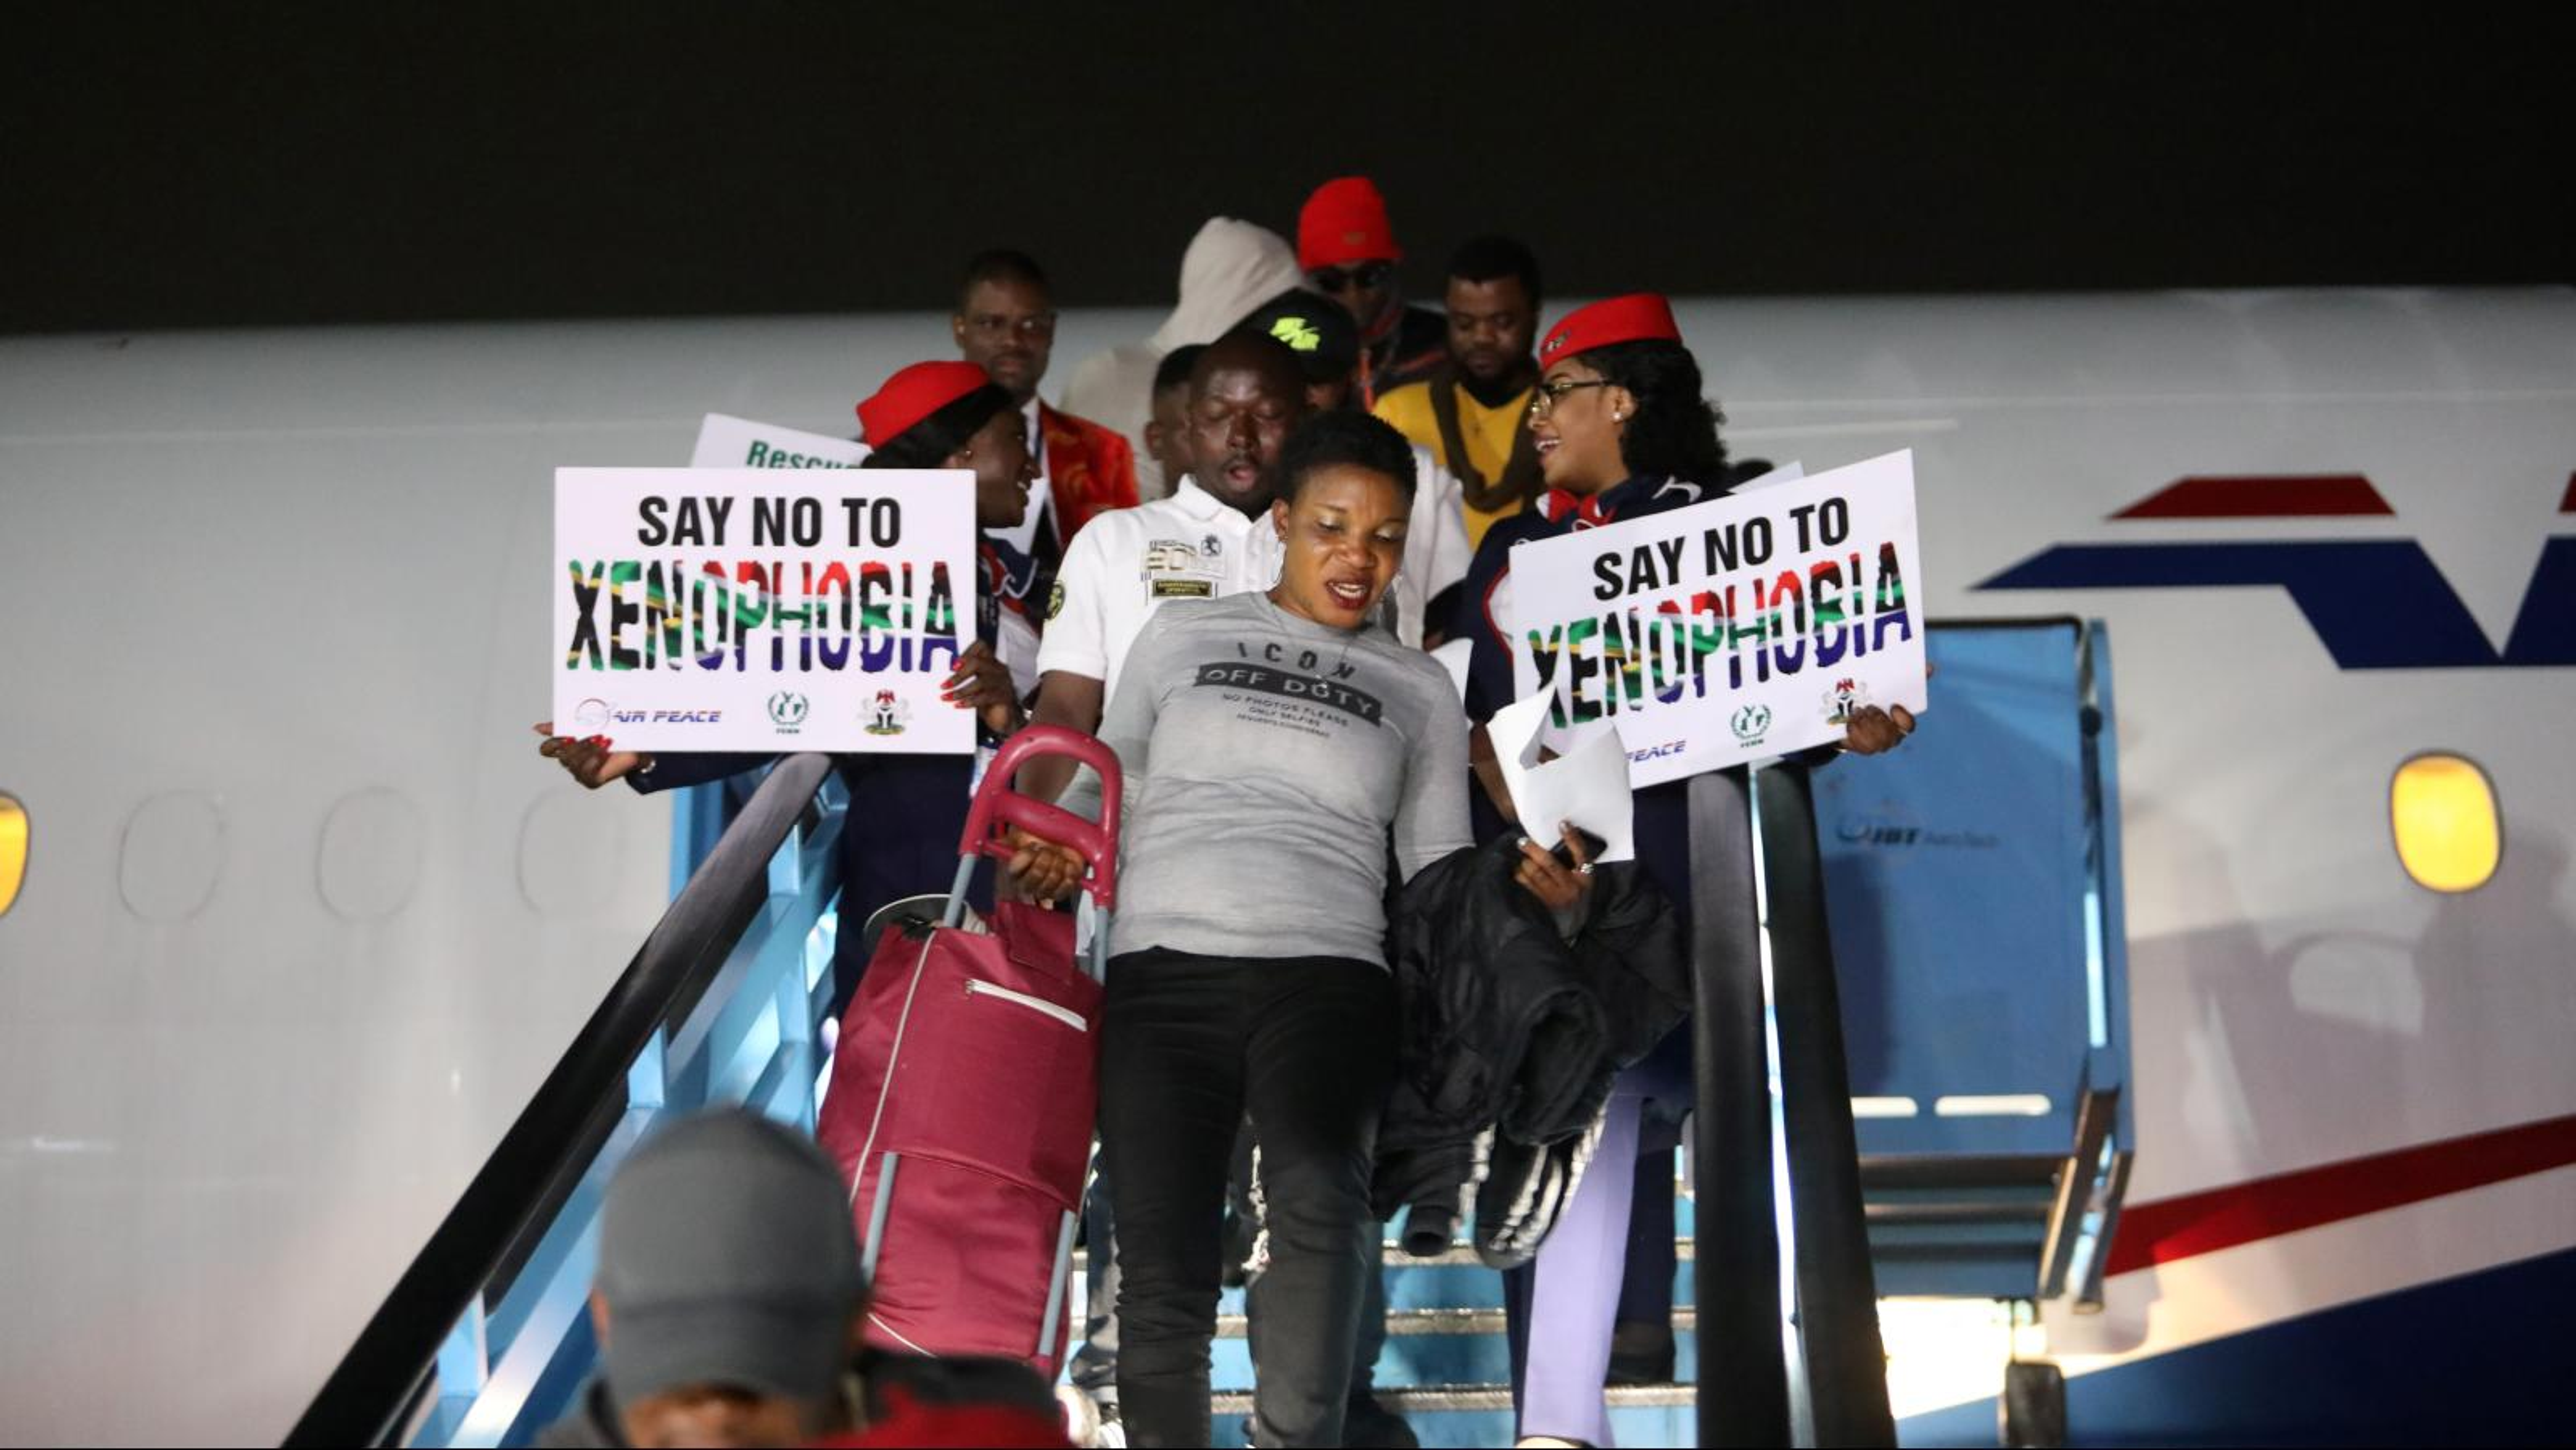 Xenophobia Reasons